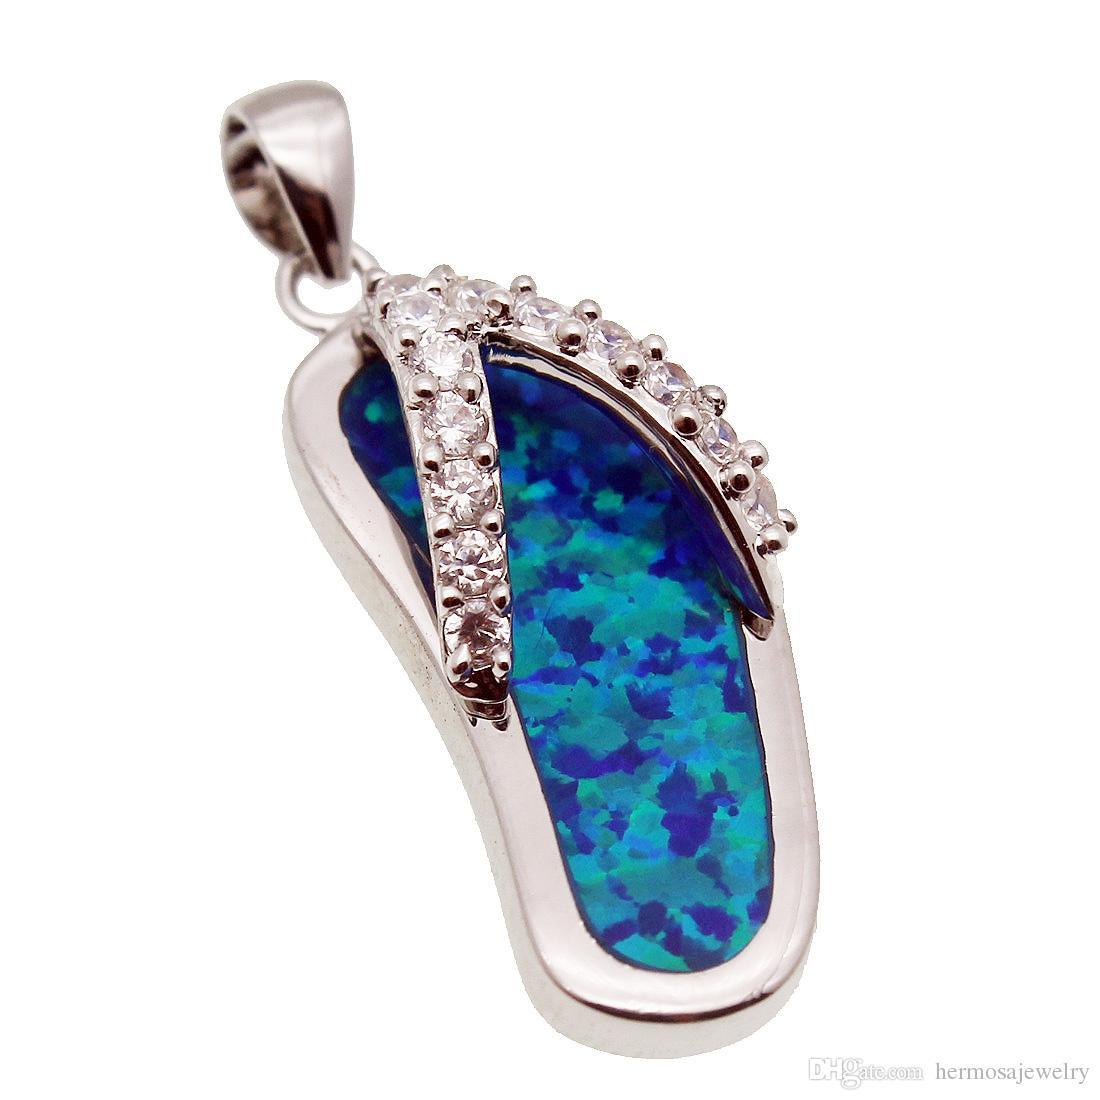 Blue opal pendants light collections light ideas wholesale blue opal pendants necklace hermosa 925 sterling silver wholesale blue opal pendants necklace hermosa 925 mozeypictures Gallery